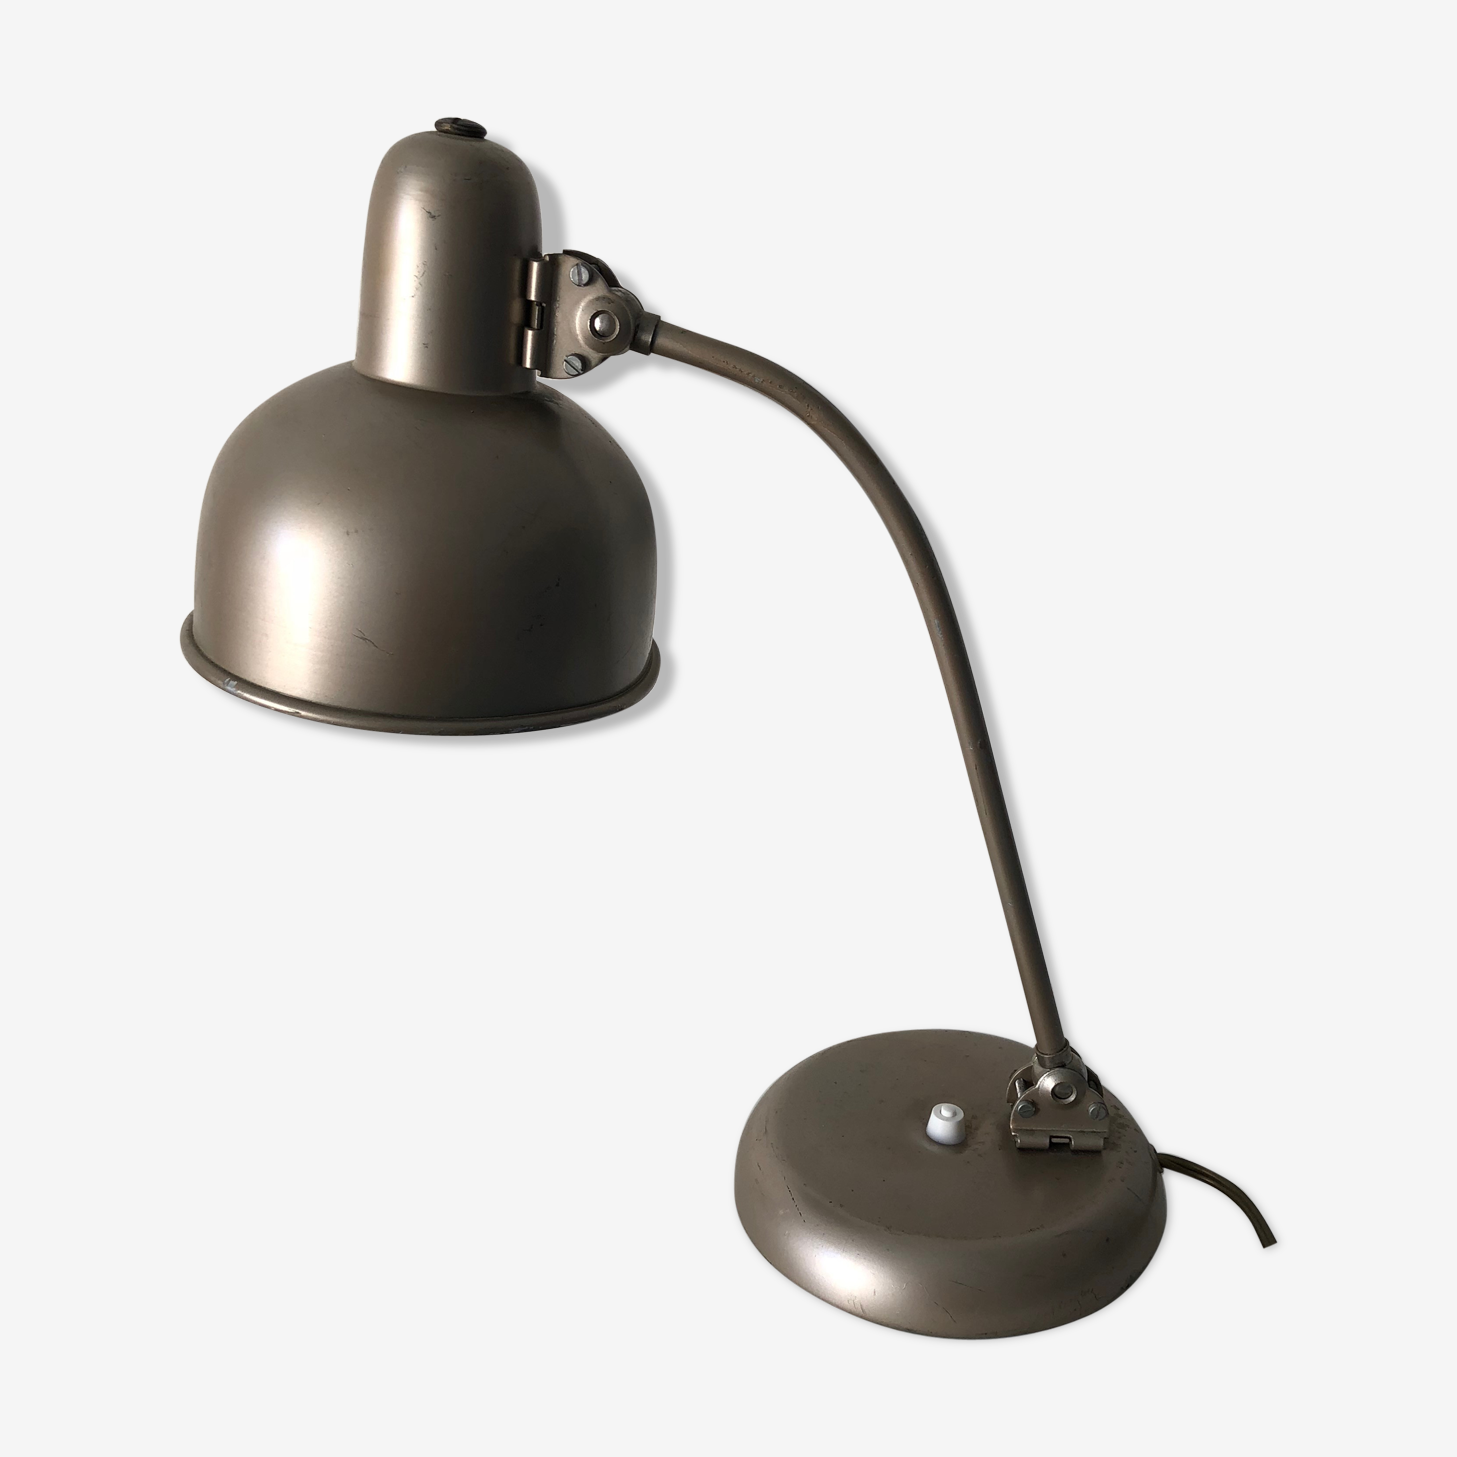 Lampe De Bureau Atelier Grege 40cm Vintage 1950 Metal Beige